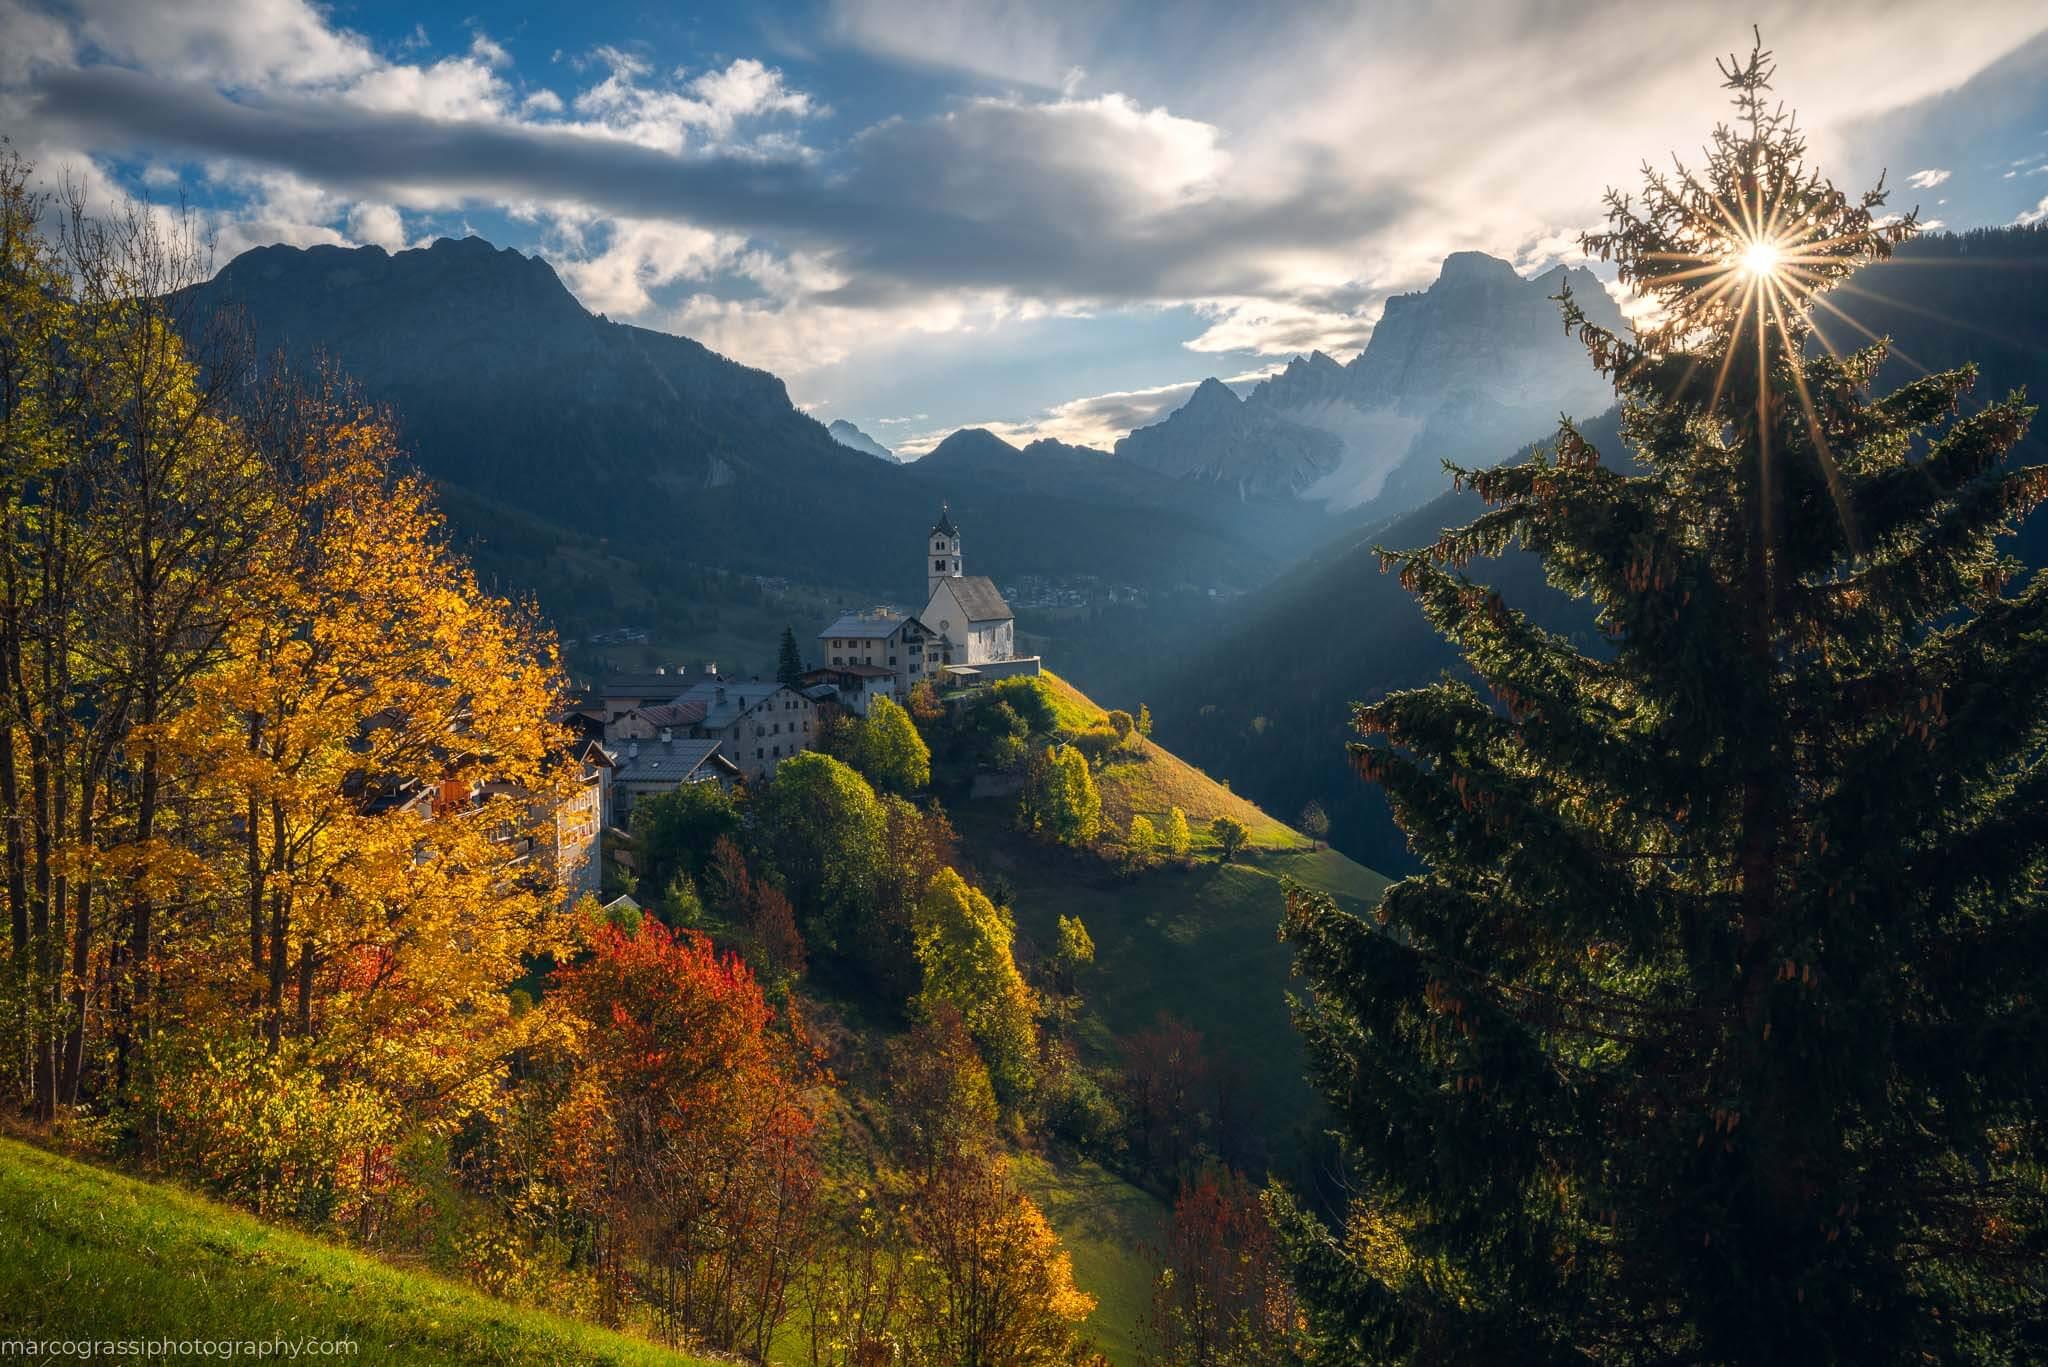 Sunrise at the church during the autumn Dolomites Photo Tour